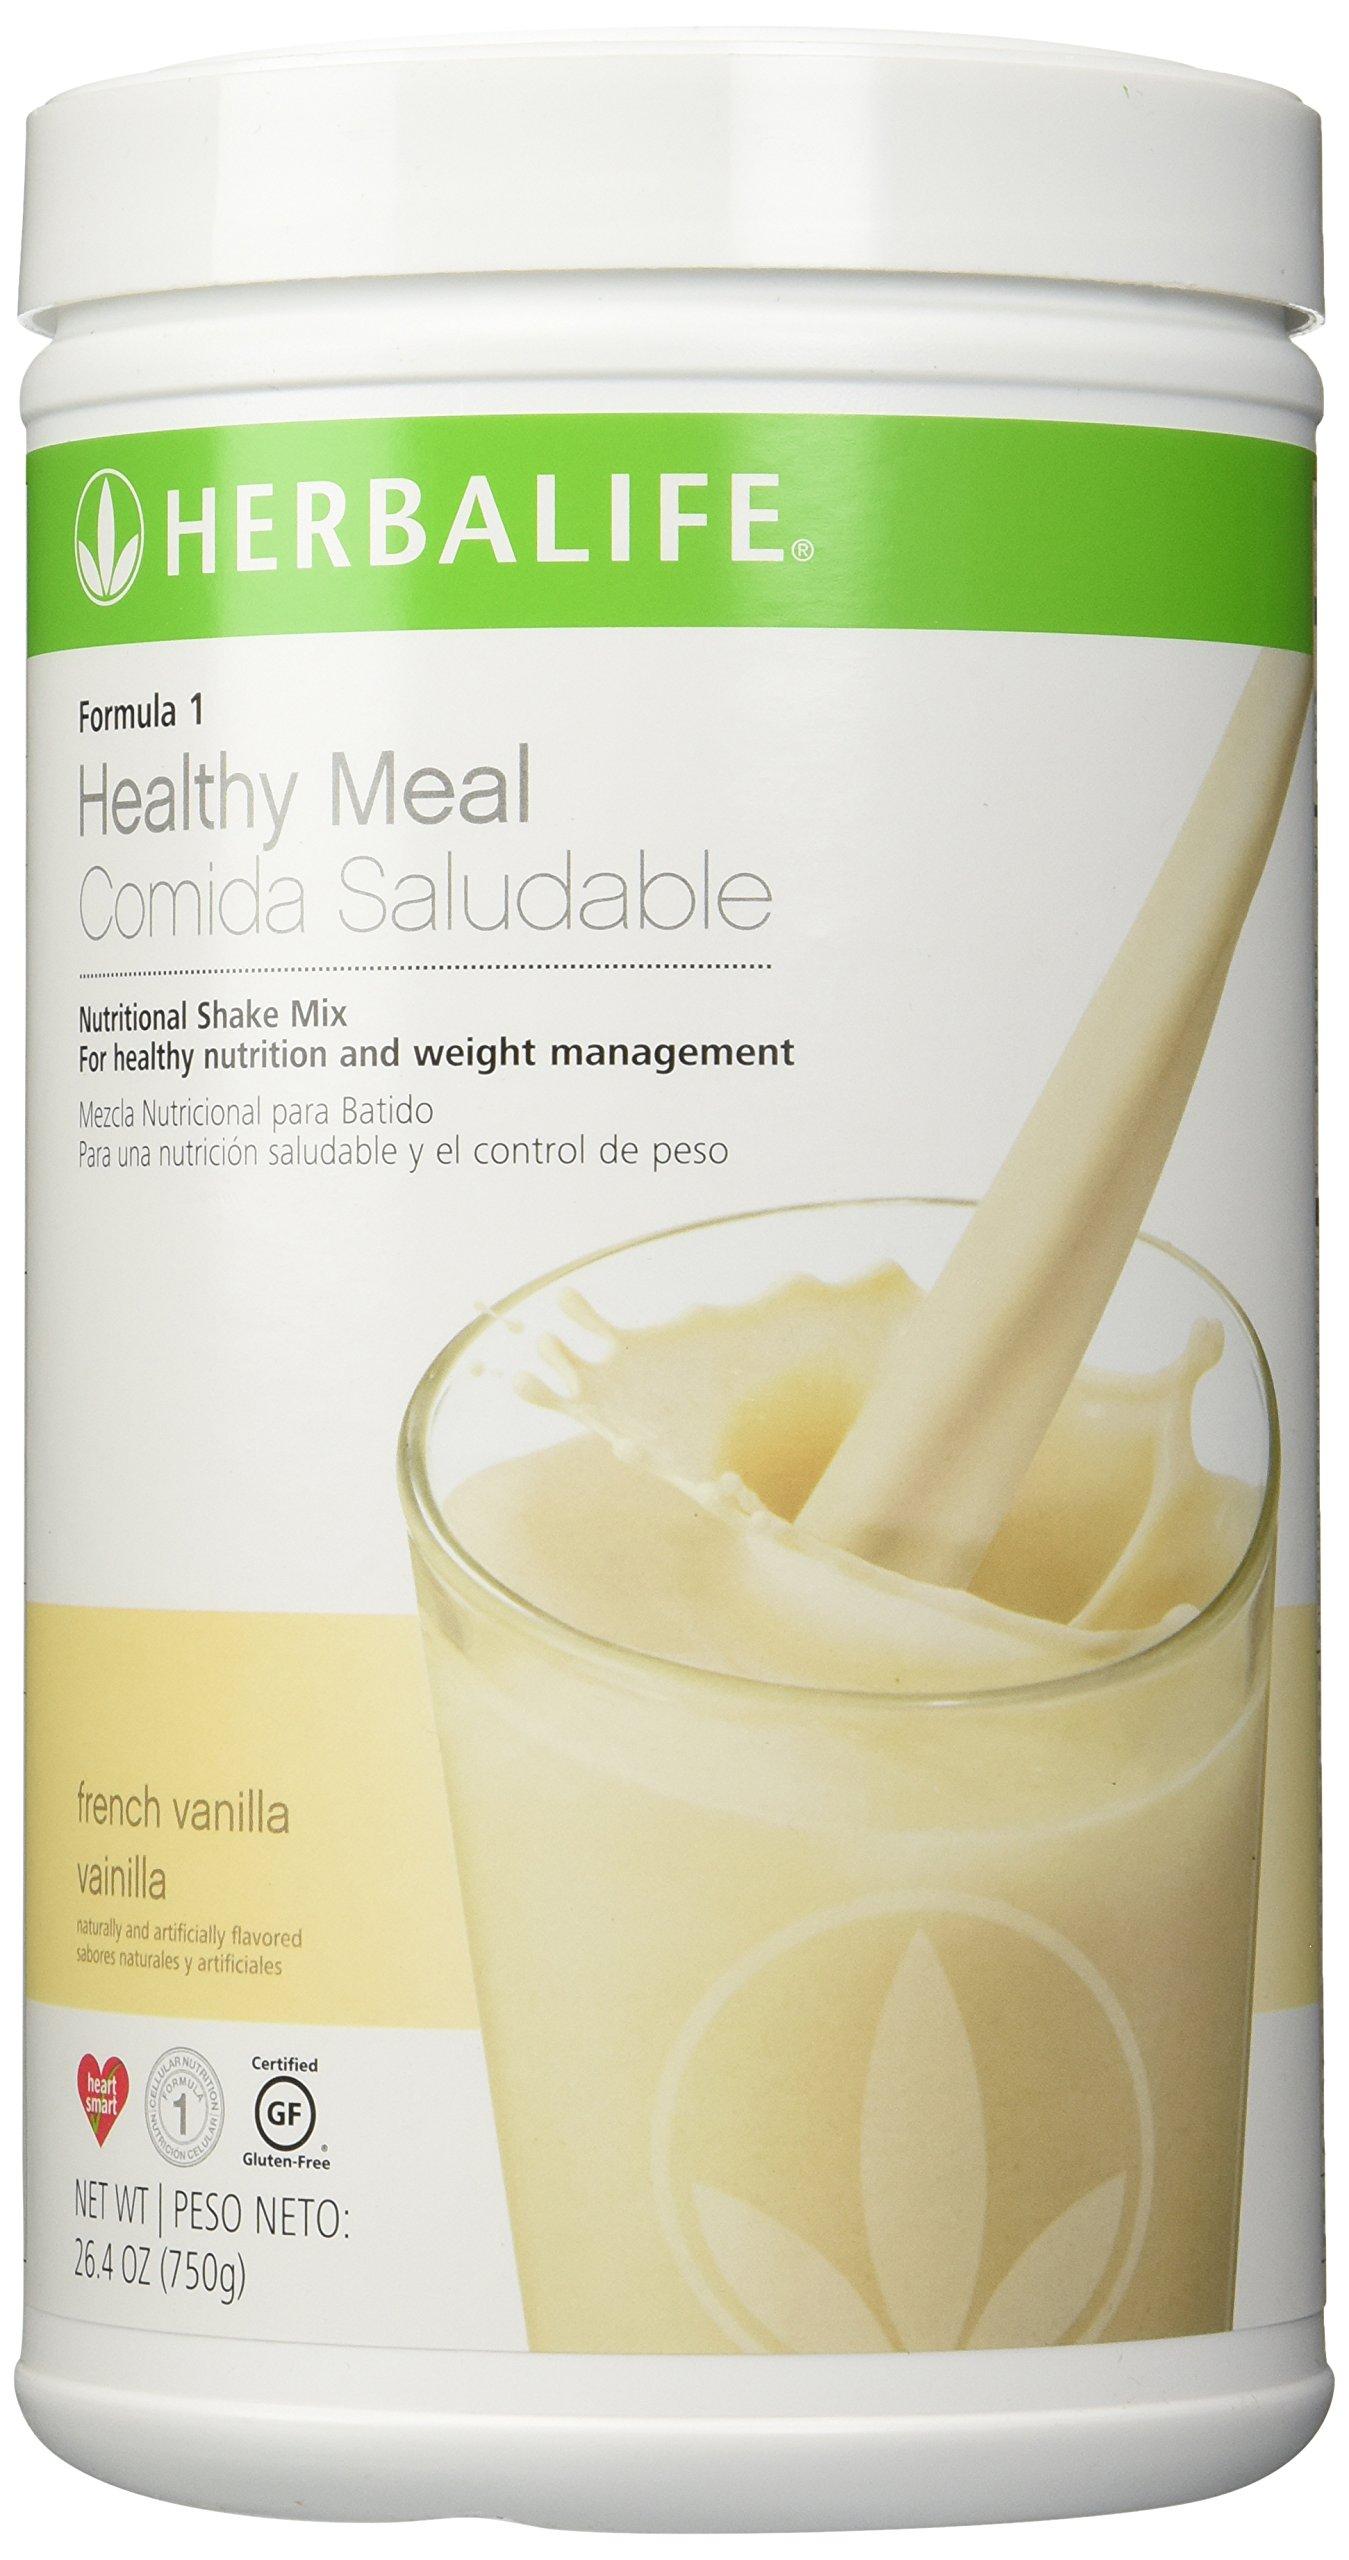 Herbalife ShapeWorks QuickStart - *Includes; VANILLA Formula 1 Healthy Meal Nutritional Shake Mix (750 g) Formula 2 Multivitamin Complex 90 tablets Formula 3 Cell Activator® 60 tablets Herbal Tea Concentrate (50 g)